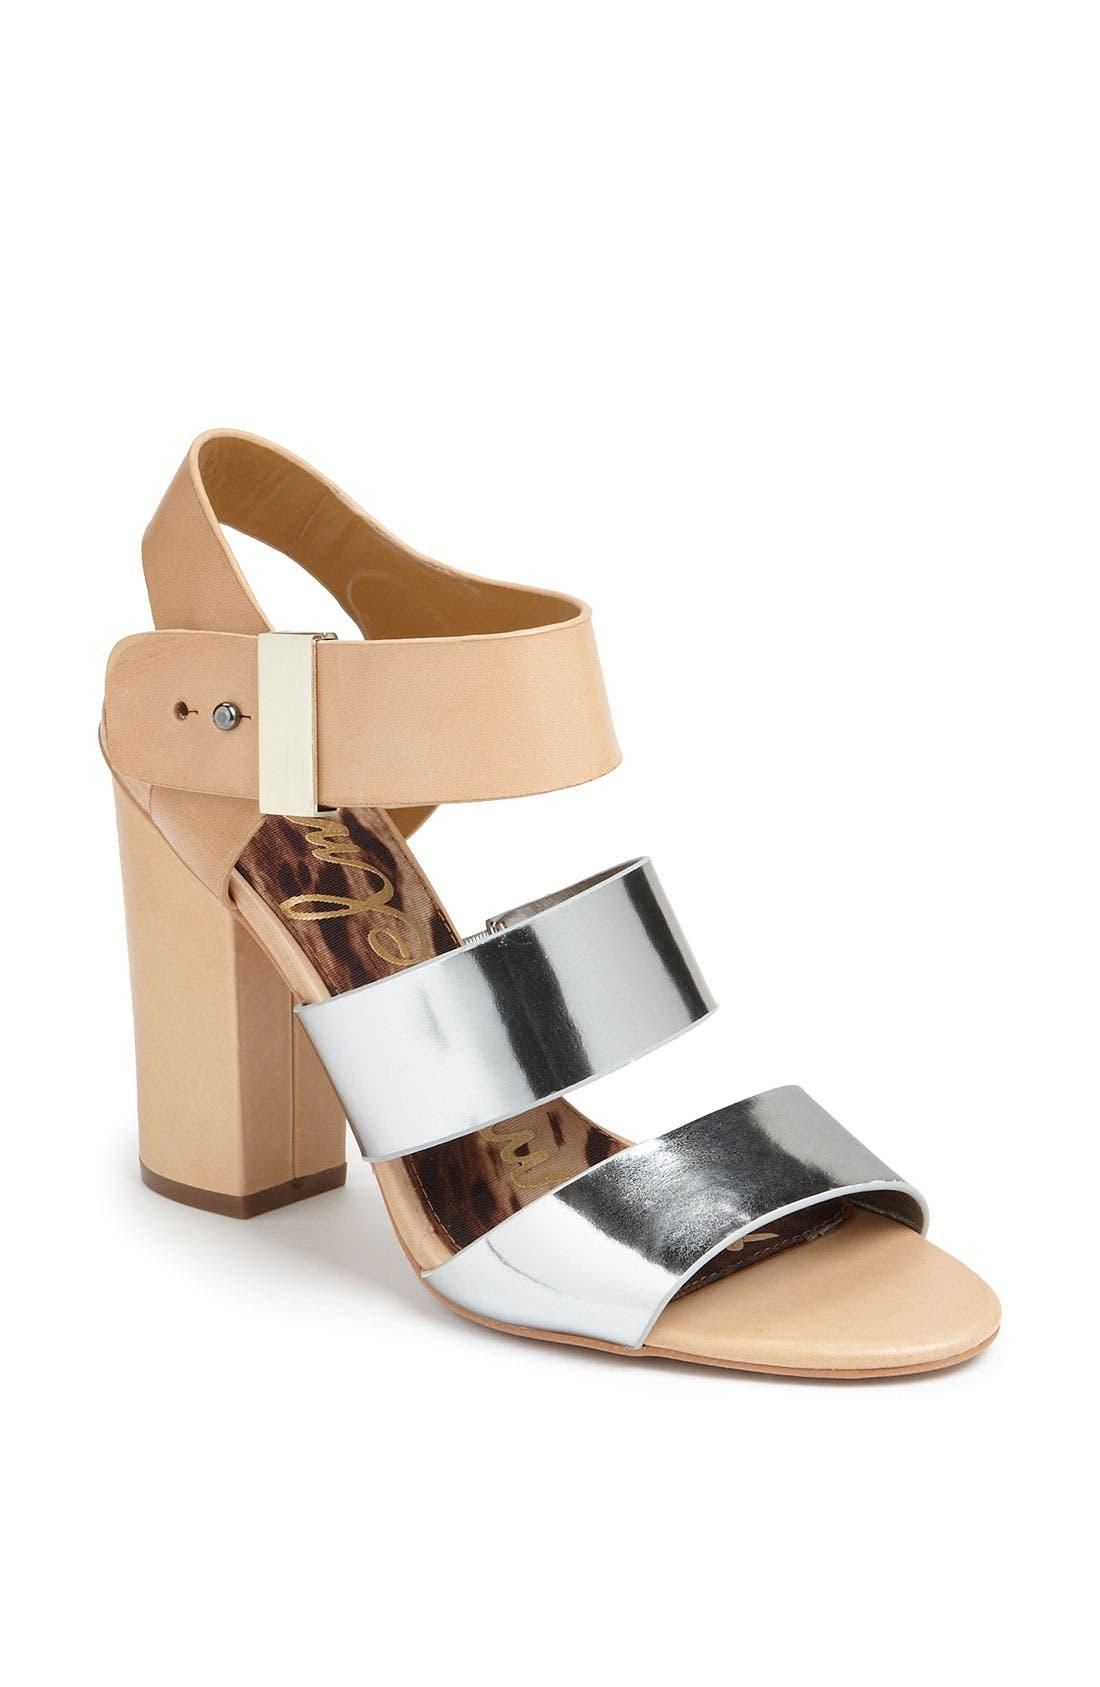 Alternate Image 1 Selected - Sam Edelman 'Yelena' Sandal